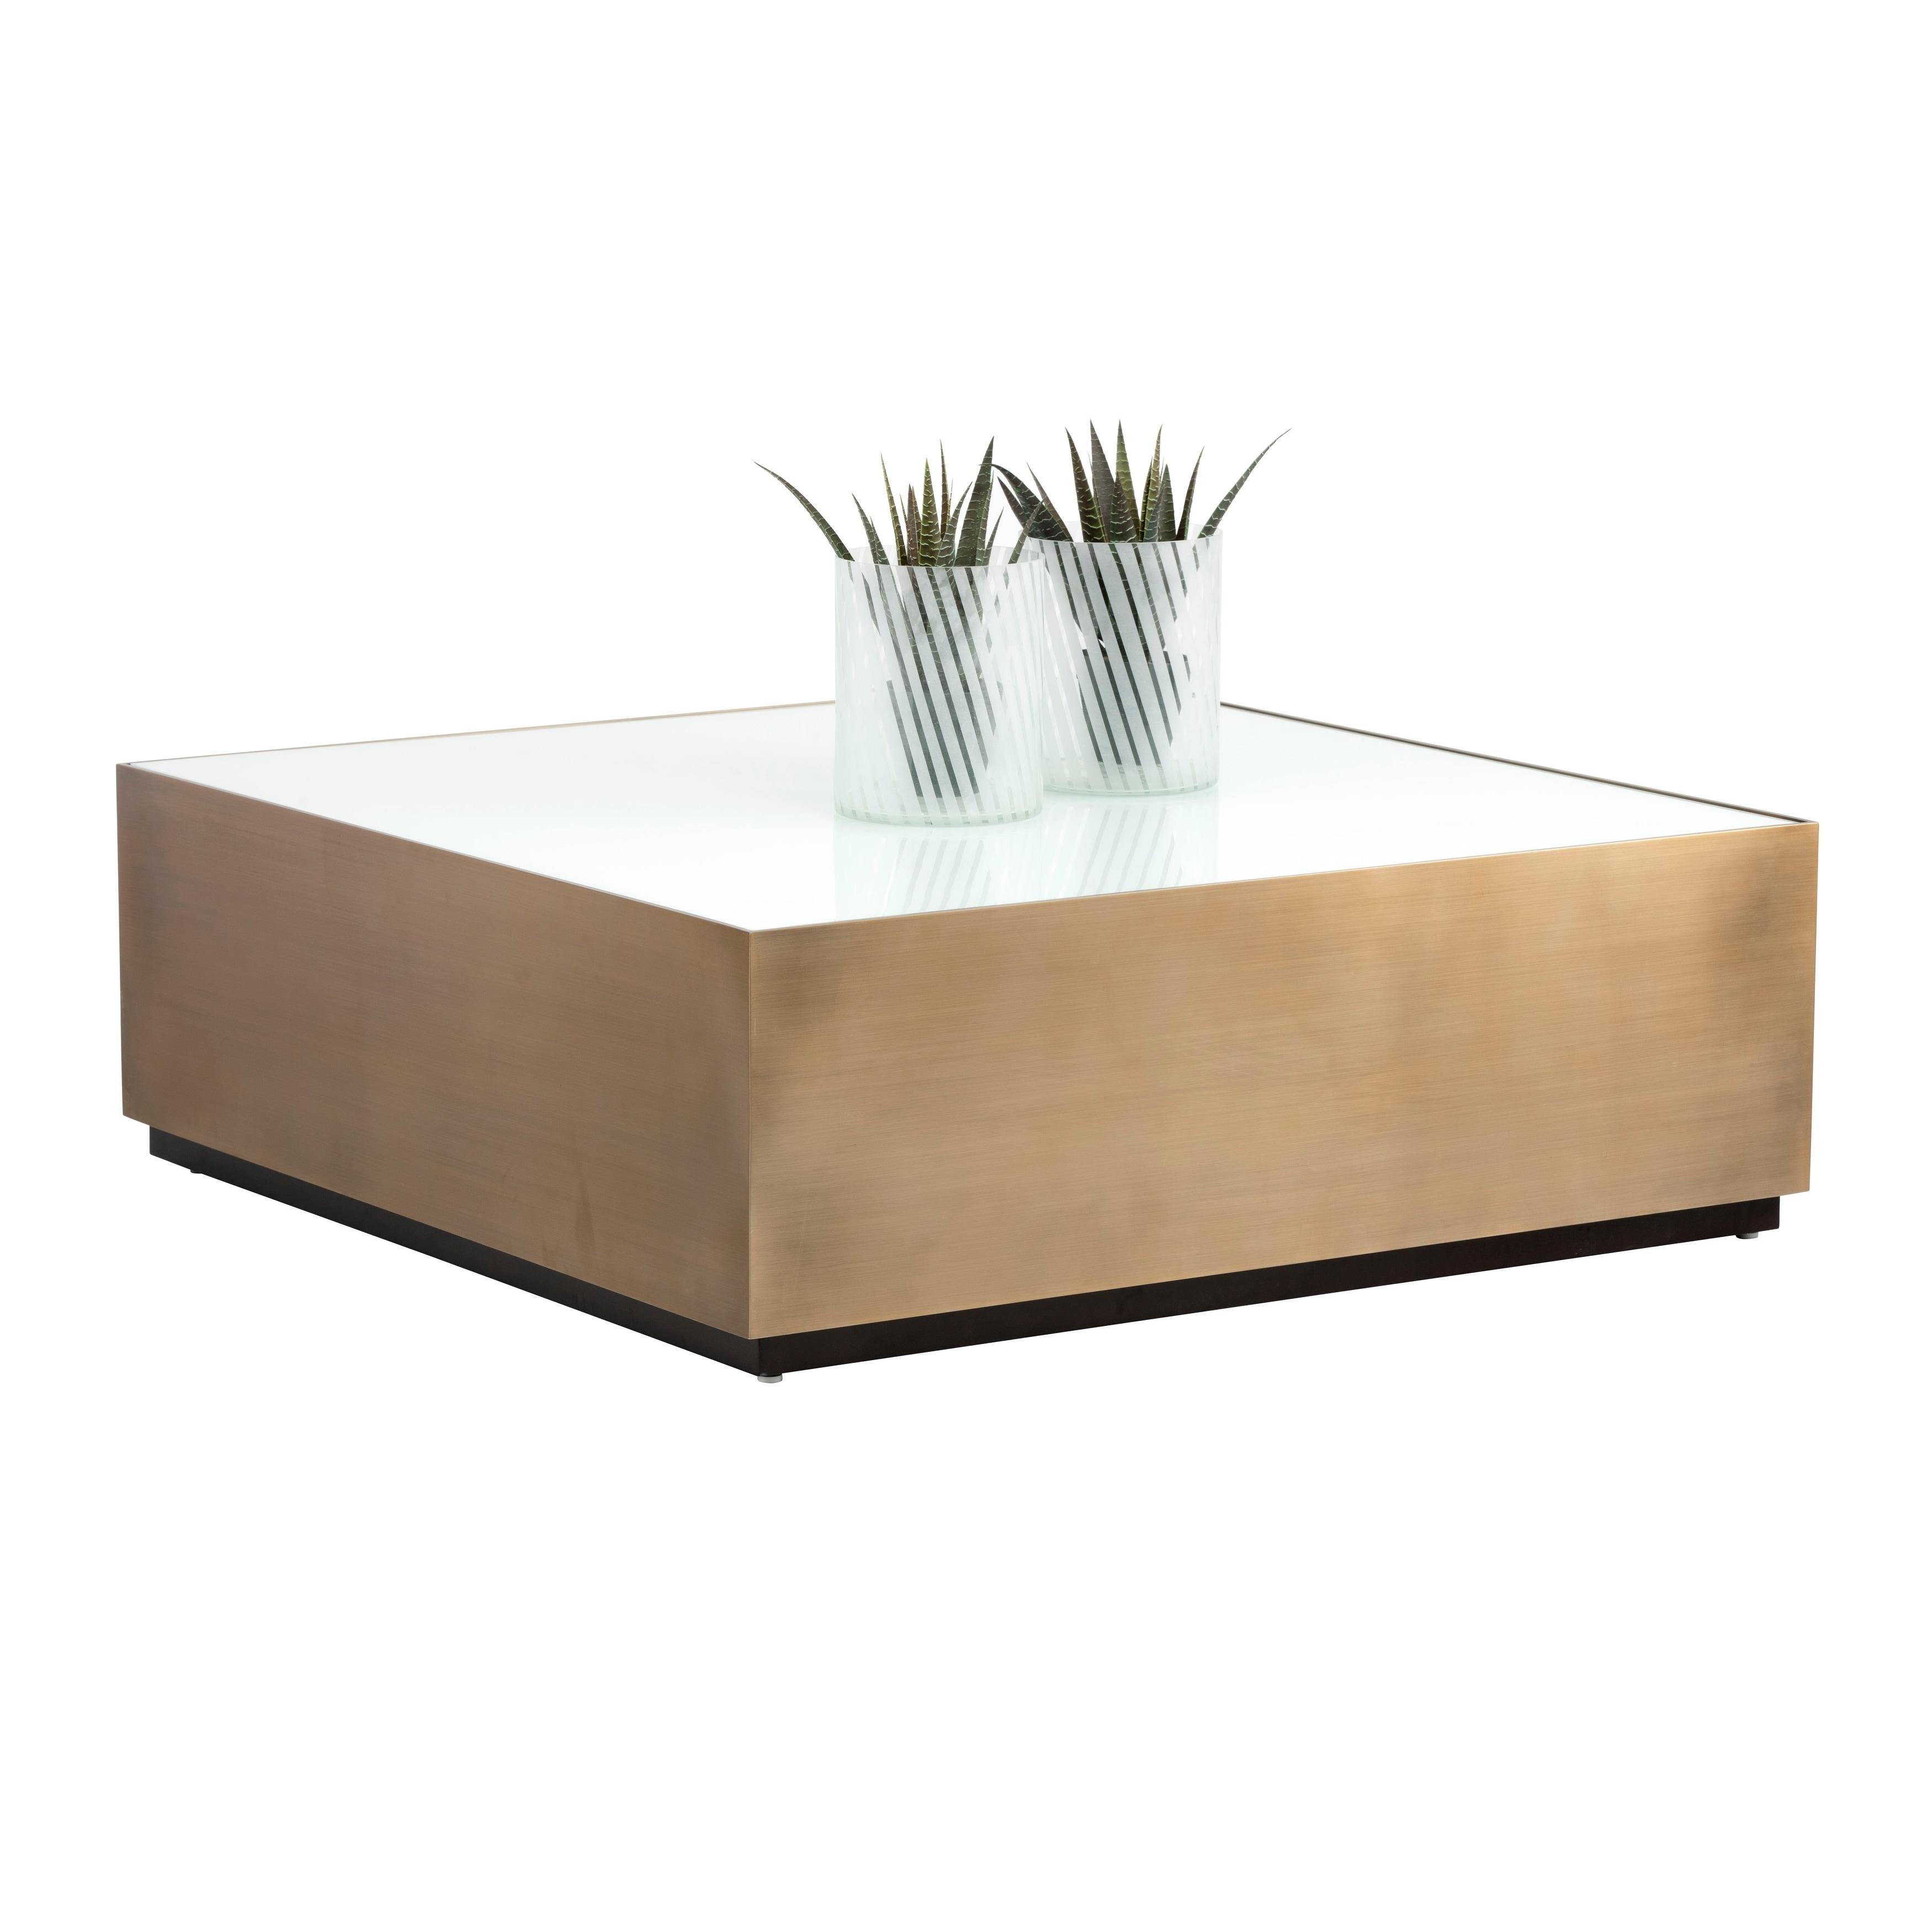 - Shop Sunpan 102669 Hudson Coffee Table - Square - White Glass - On